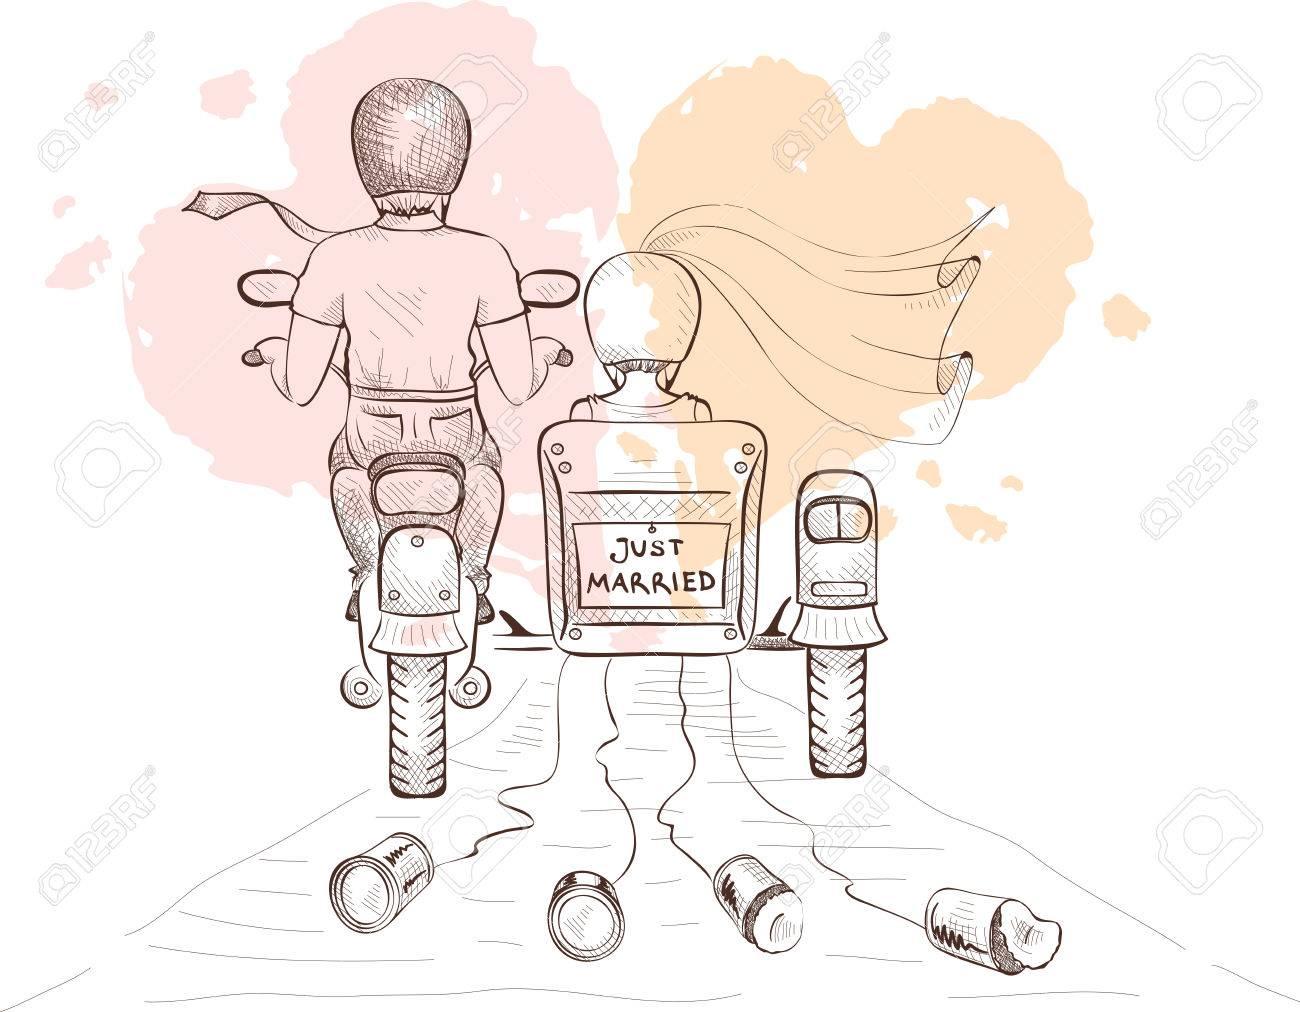 Grafik Vektor-Illustration - Braut Und Bräutigam Auf Einem Motorrad ...